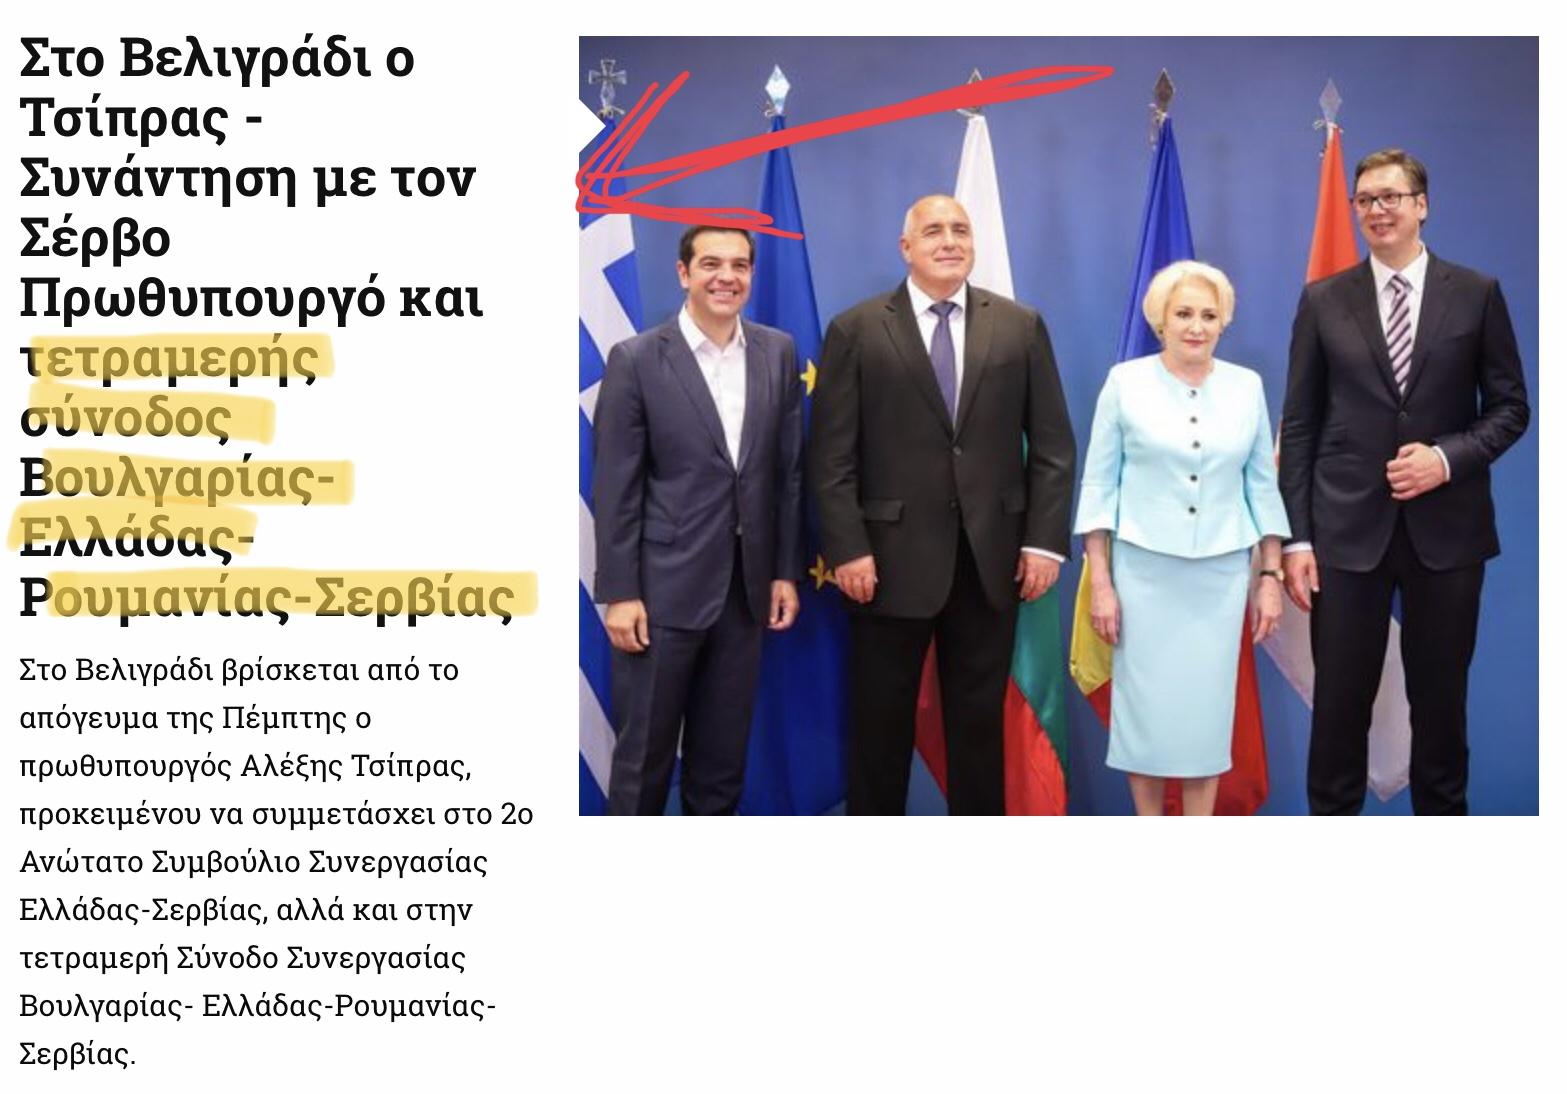 "https://youtu.be/Q_wJZQs163Q «Θέλω να ευχαριστήσω τον Έλληνα πρωθυπουργό και την Ελλάδα για την υποστήριξη στην εδαφική ακεραιότητα της Σερβίας. Οι πολίτες τη Σερβίας θεωρούν την Ελλάδα σύμμαχο και φίλη χώρα τόσο στη πολιτική όσο και στην οικονομία και σε άλλα σημαντικά ζητήματα», αναφέρει ο πρόεδρος της Σερβίας Αλεξάνταρ Βούτσιτς σε ανάρτησή του στο twitter μετά τη συνάντηση του με τον πρωθυπουργό Αλέξη Τσίπρα στο Βελιγράδι Και κάποιοι εκ των έσω, θεωρούσαν ότι ο Καμμένος τους παίρνει τη δουλειά, κάνοντας «εξωτερική πολιτική». Ιδού τώρα η εξέλιξη, και σε περίπτωση που δεν περάσει η συμφωνία των Πρεσπών, σε αυτή την τετραμερή θα προχωρήσουν και τα Σκόπια. Όπως ακριβώς το πρότεινε ο Πάνος Καμμένος. [gallery ids=""49596,49597,49599,49600"" type=""rectangular""]"